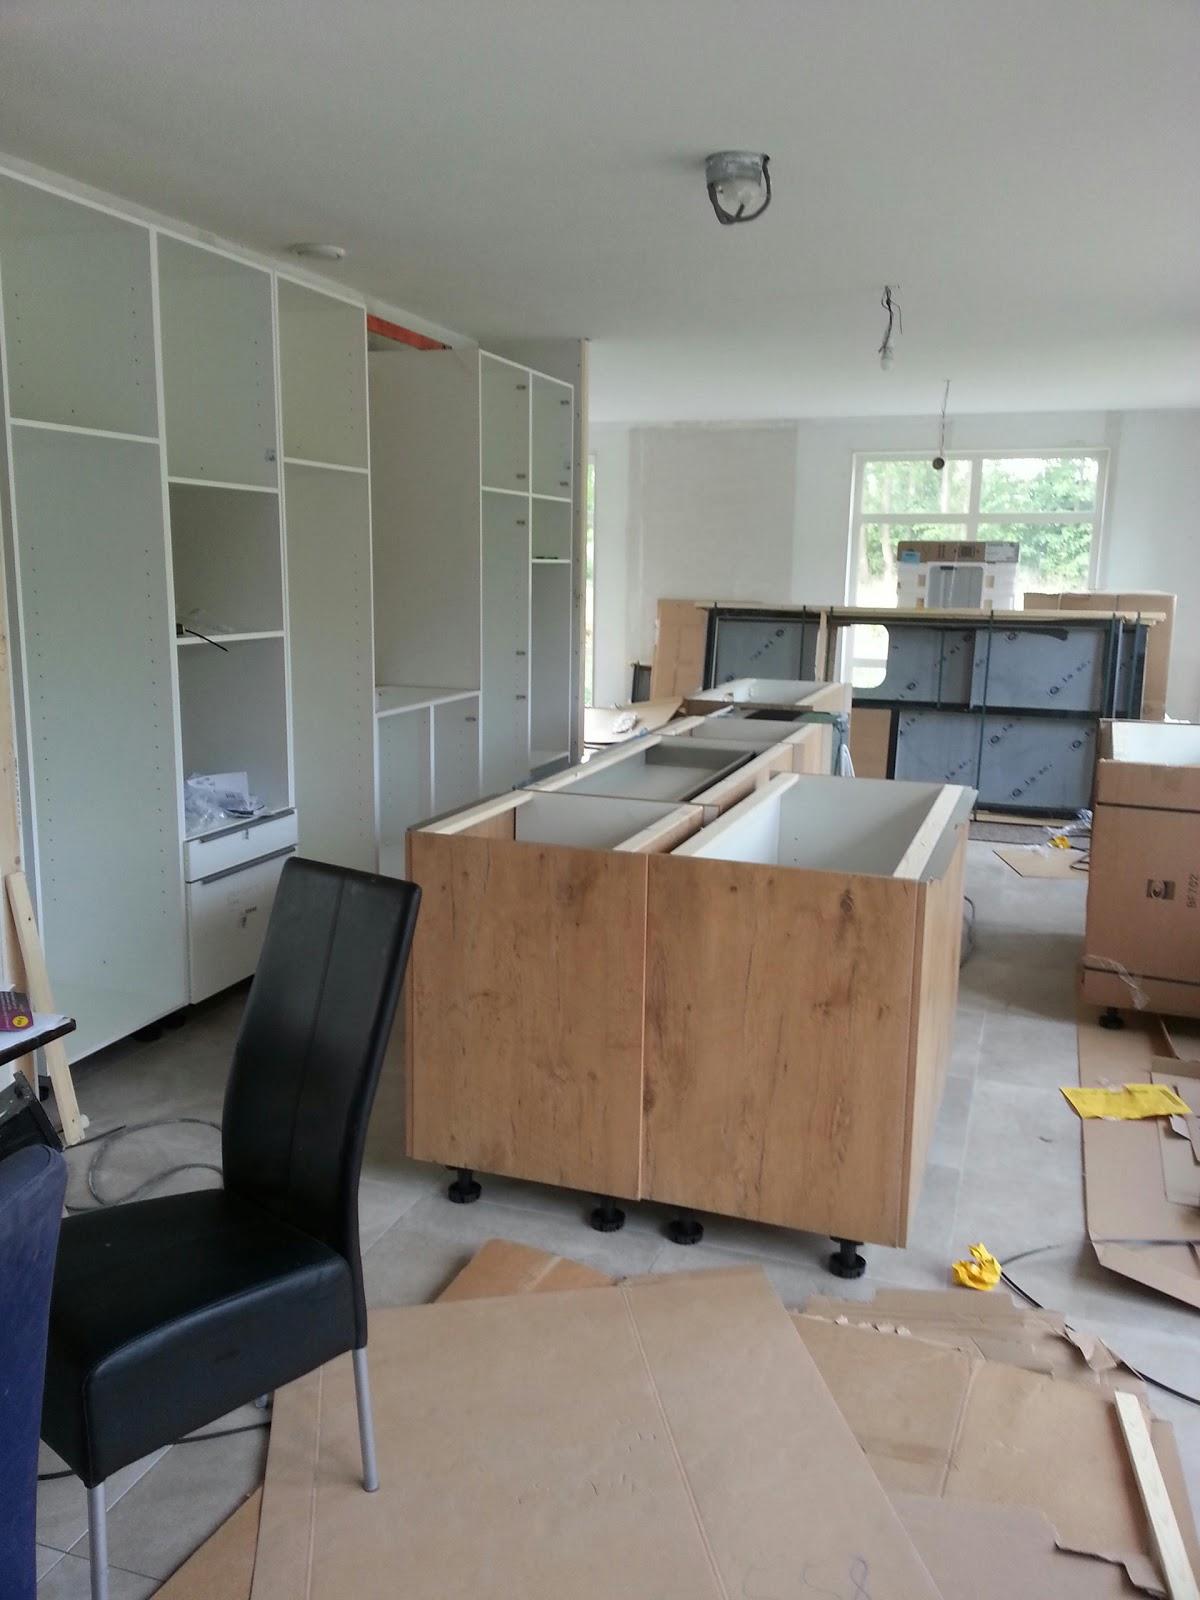 Eigen huis bouwen for Zelf keuken samenstellen